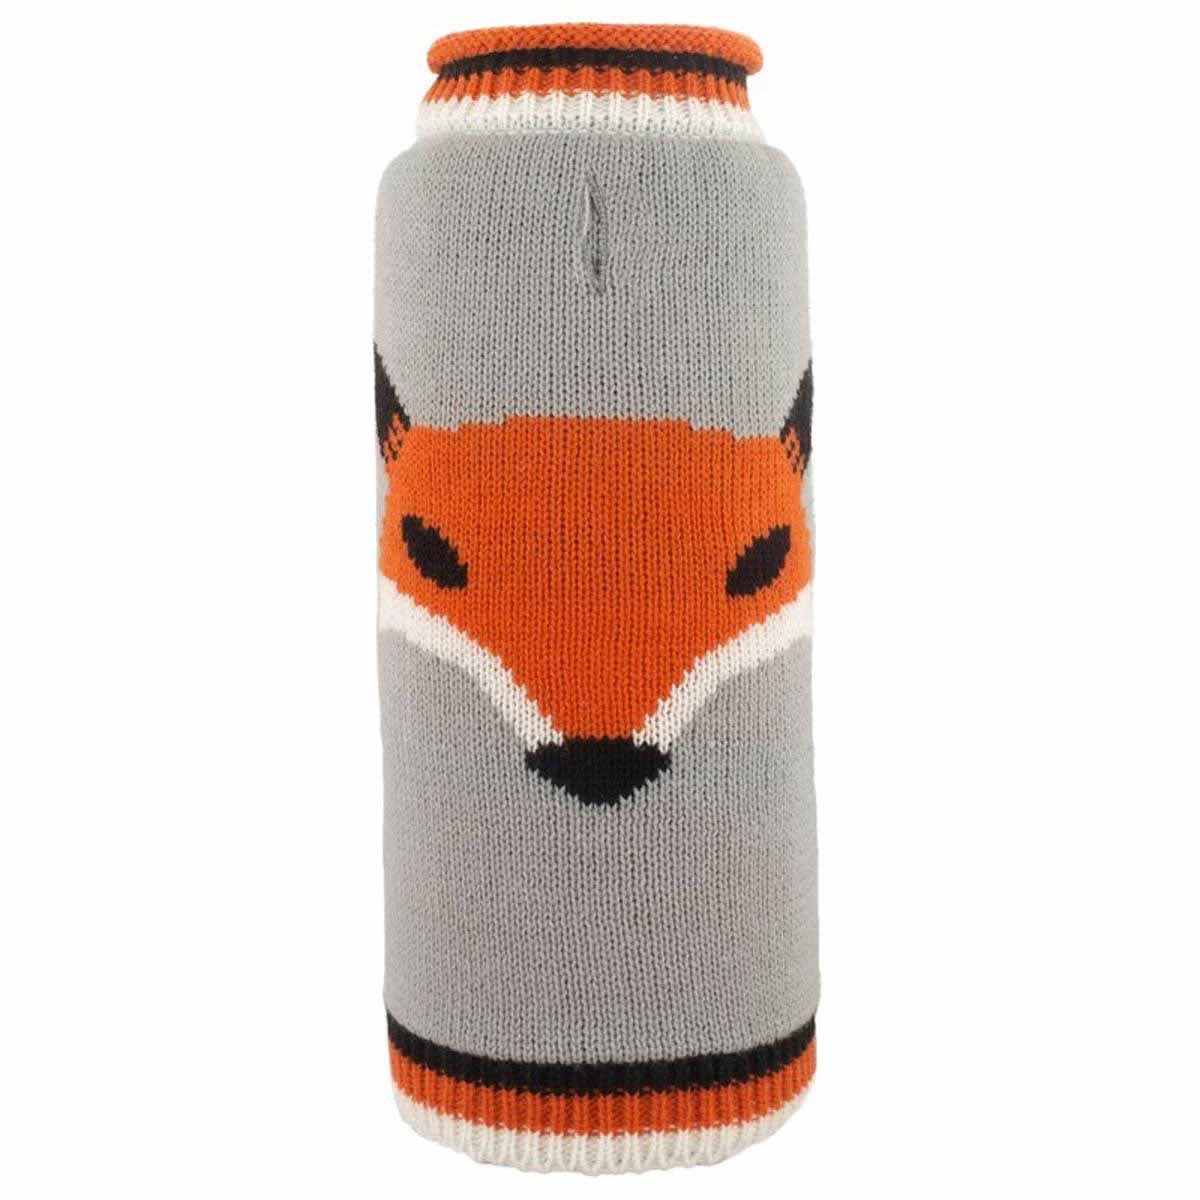 Worthy Dog Foxy Dog Sweater - Gray